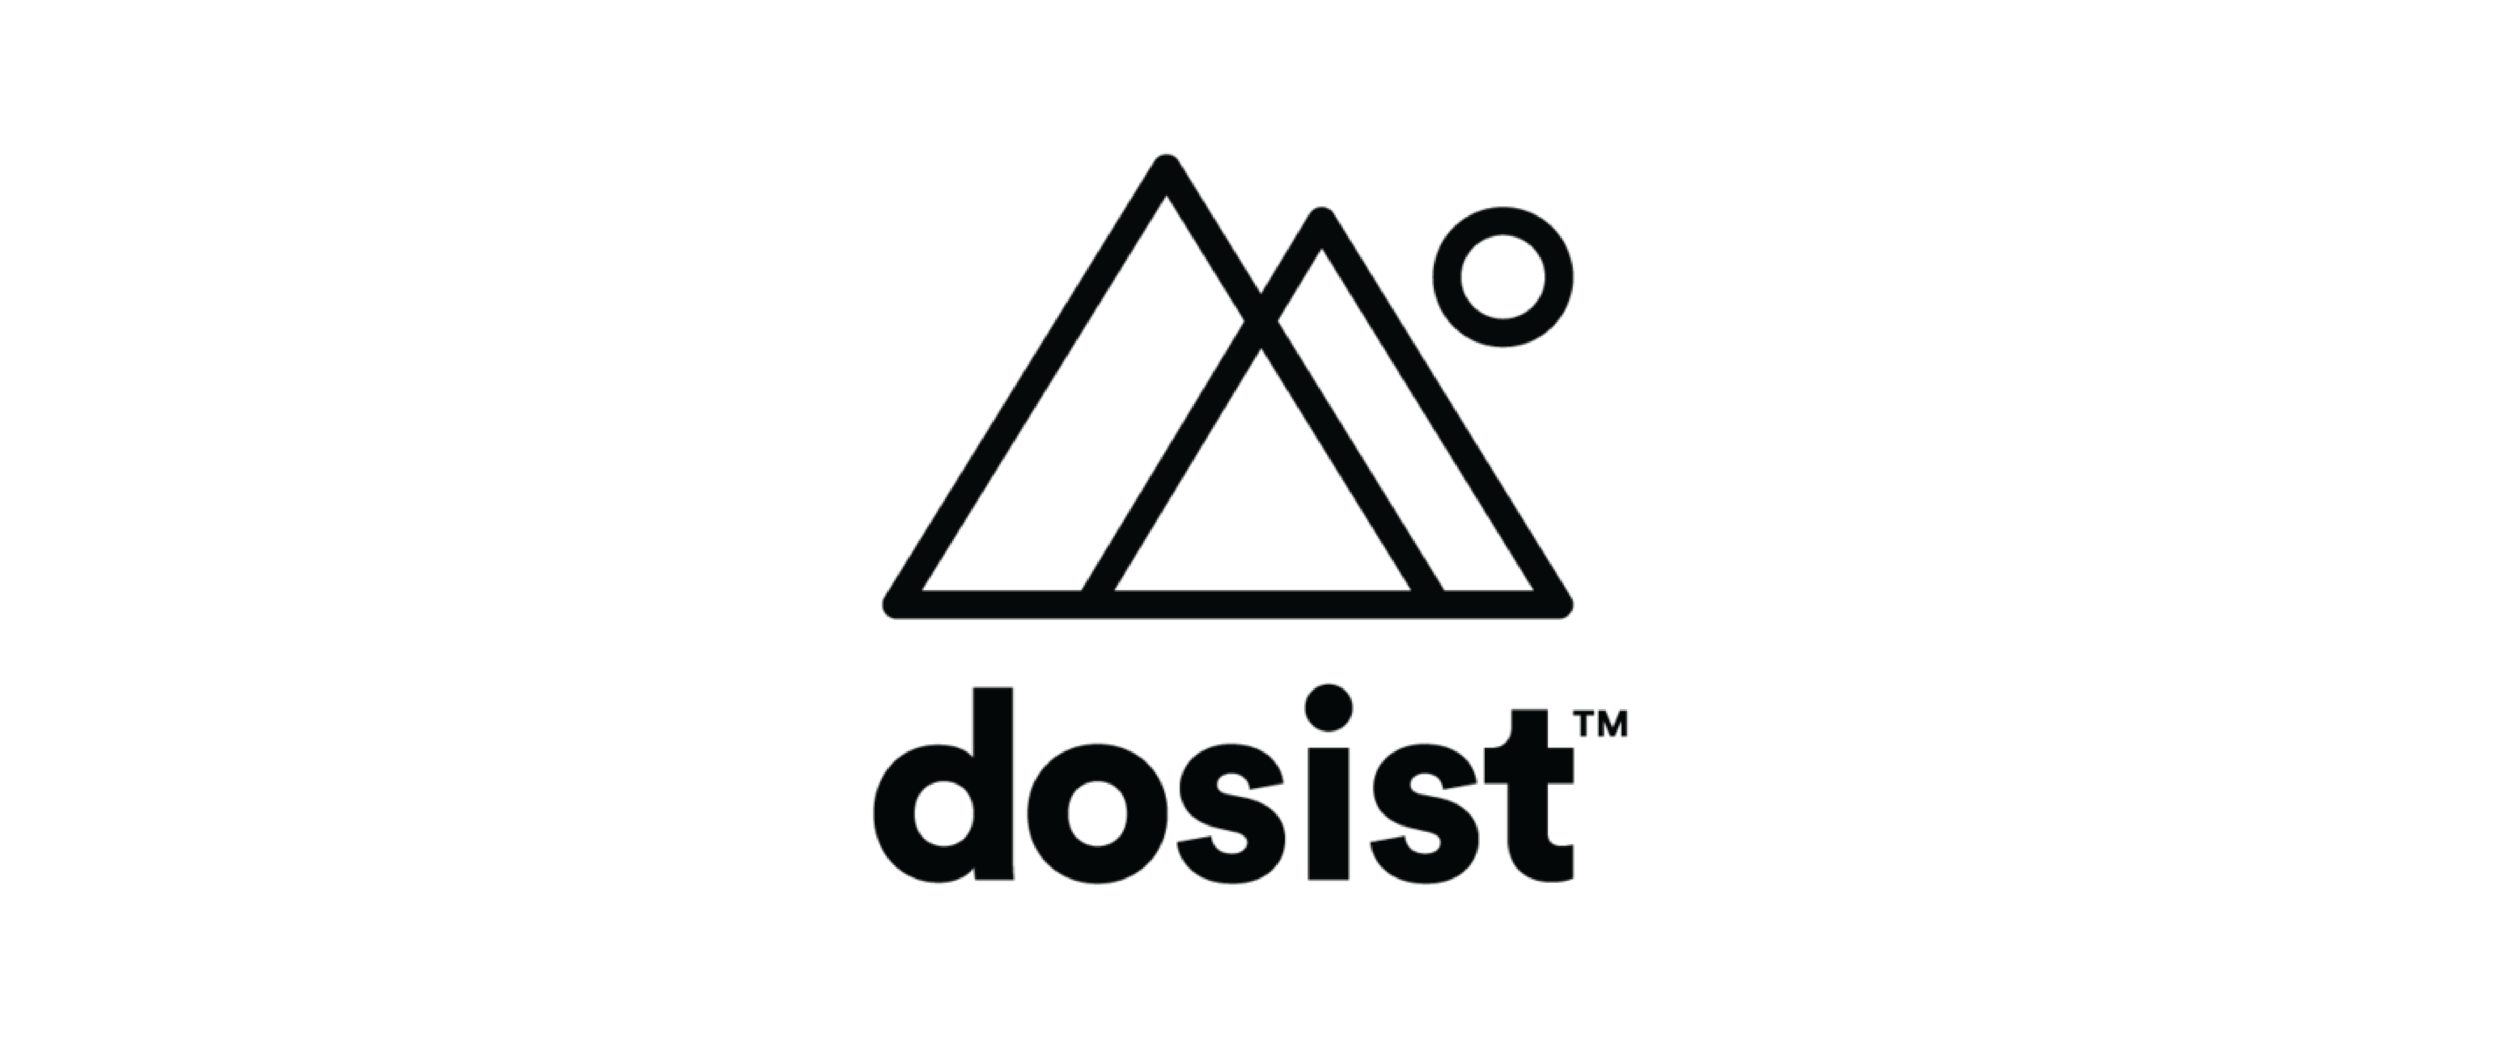 dosist-04.png